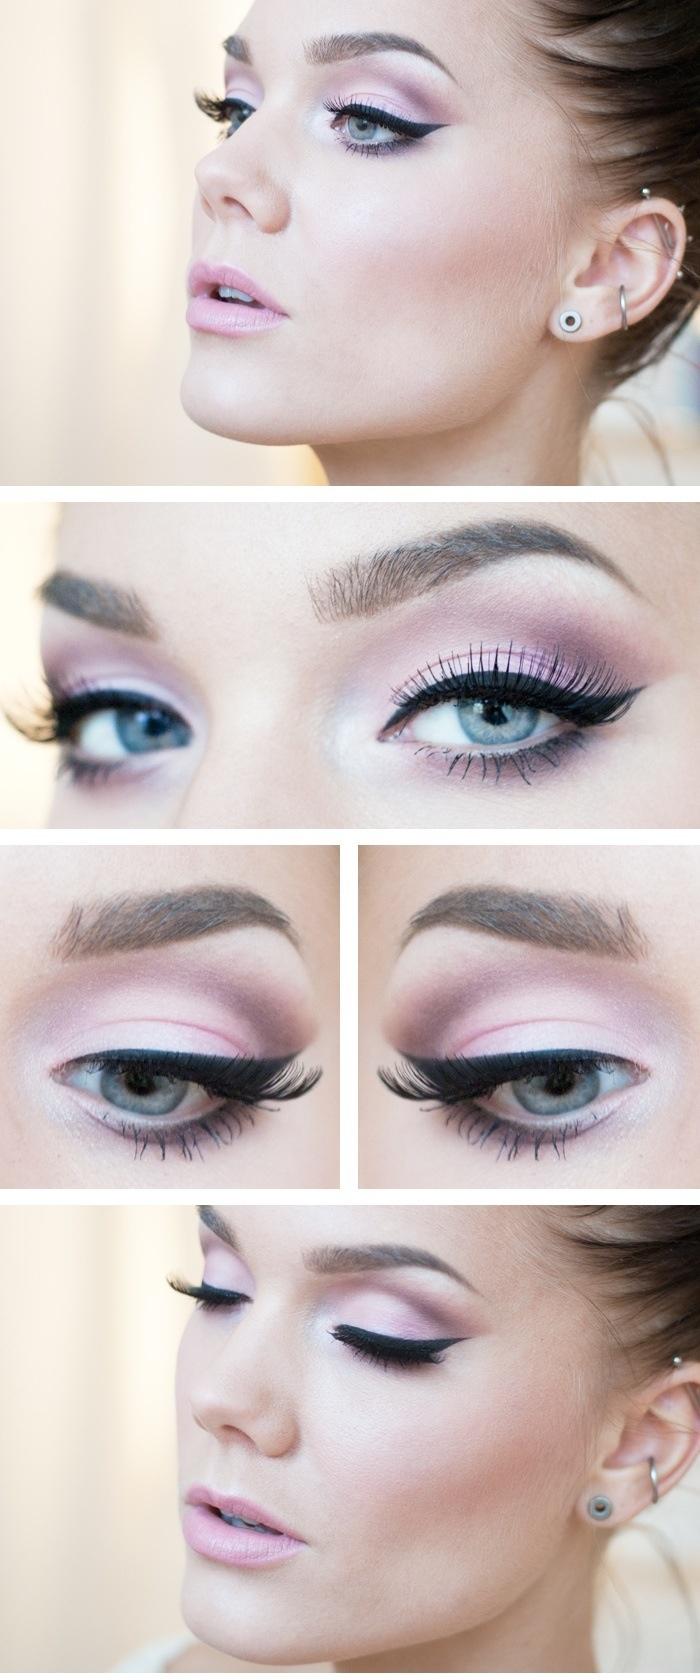 Pink eyeshadow with black liner